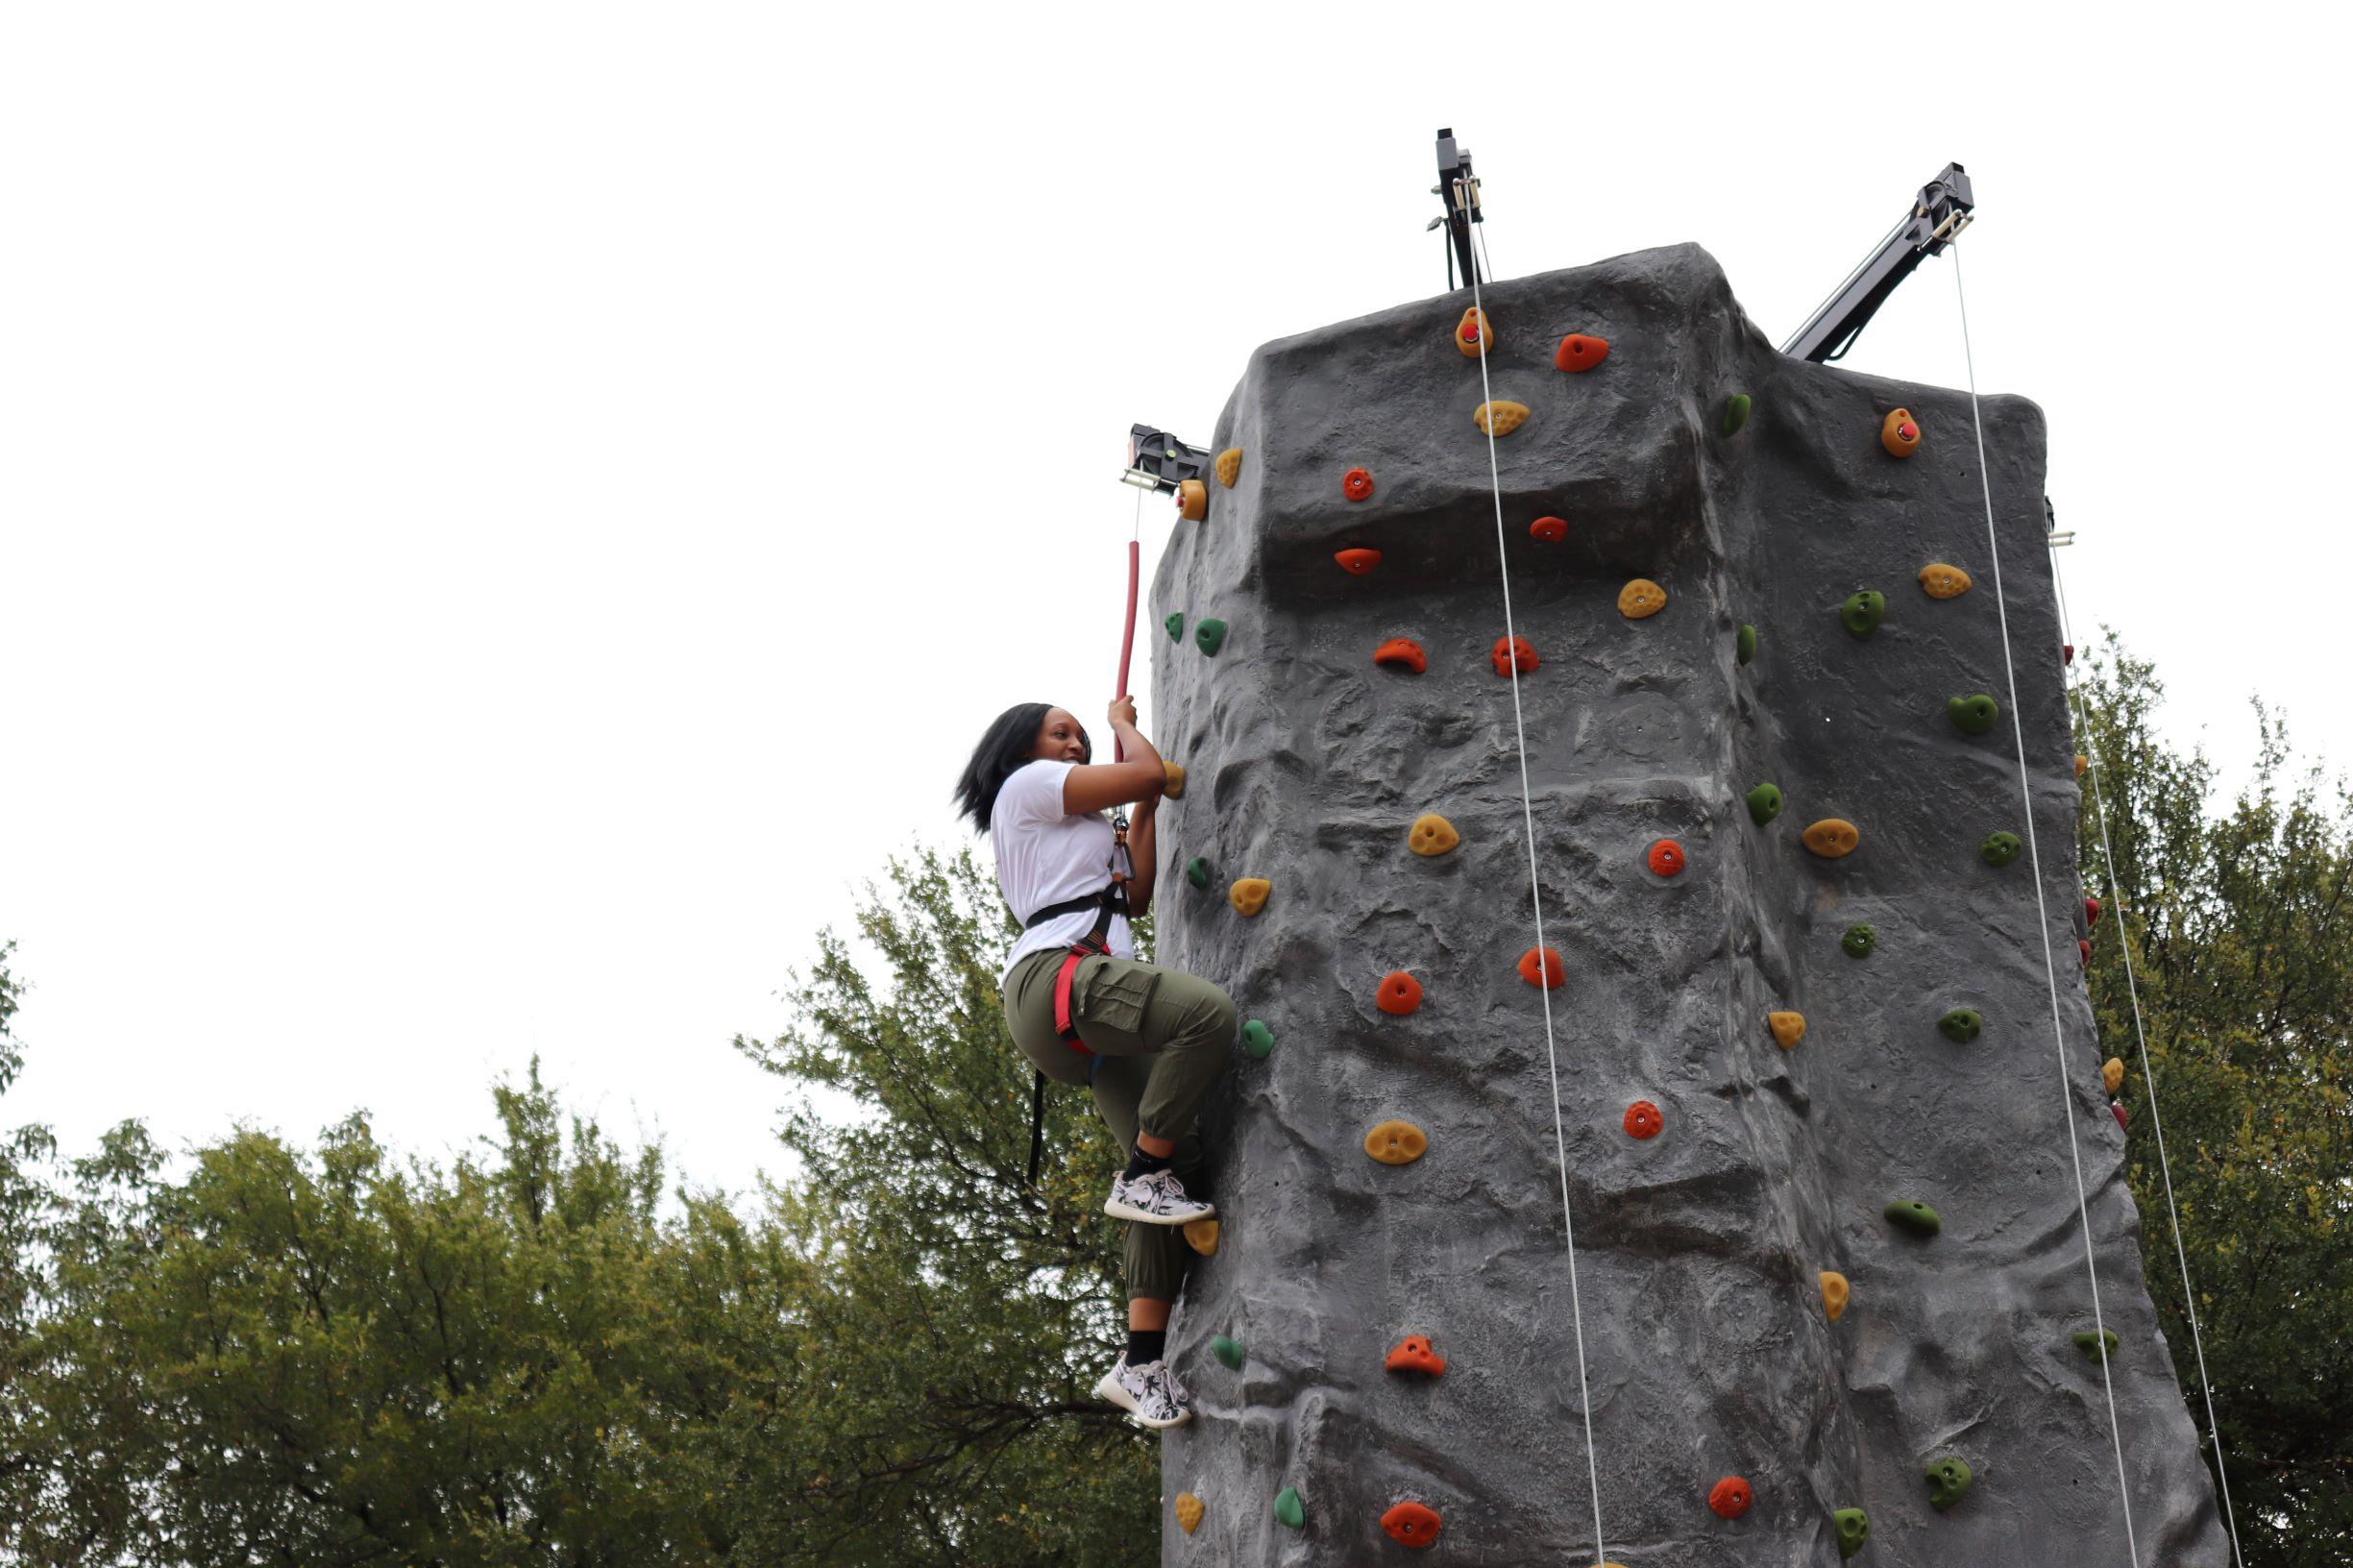 Rock wall climbing during team member appreciation week.